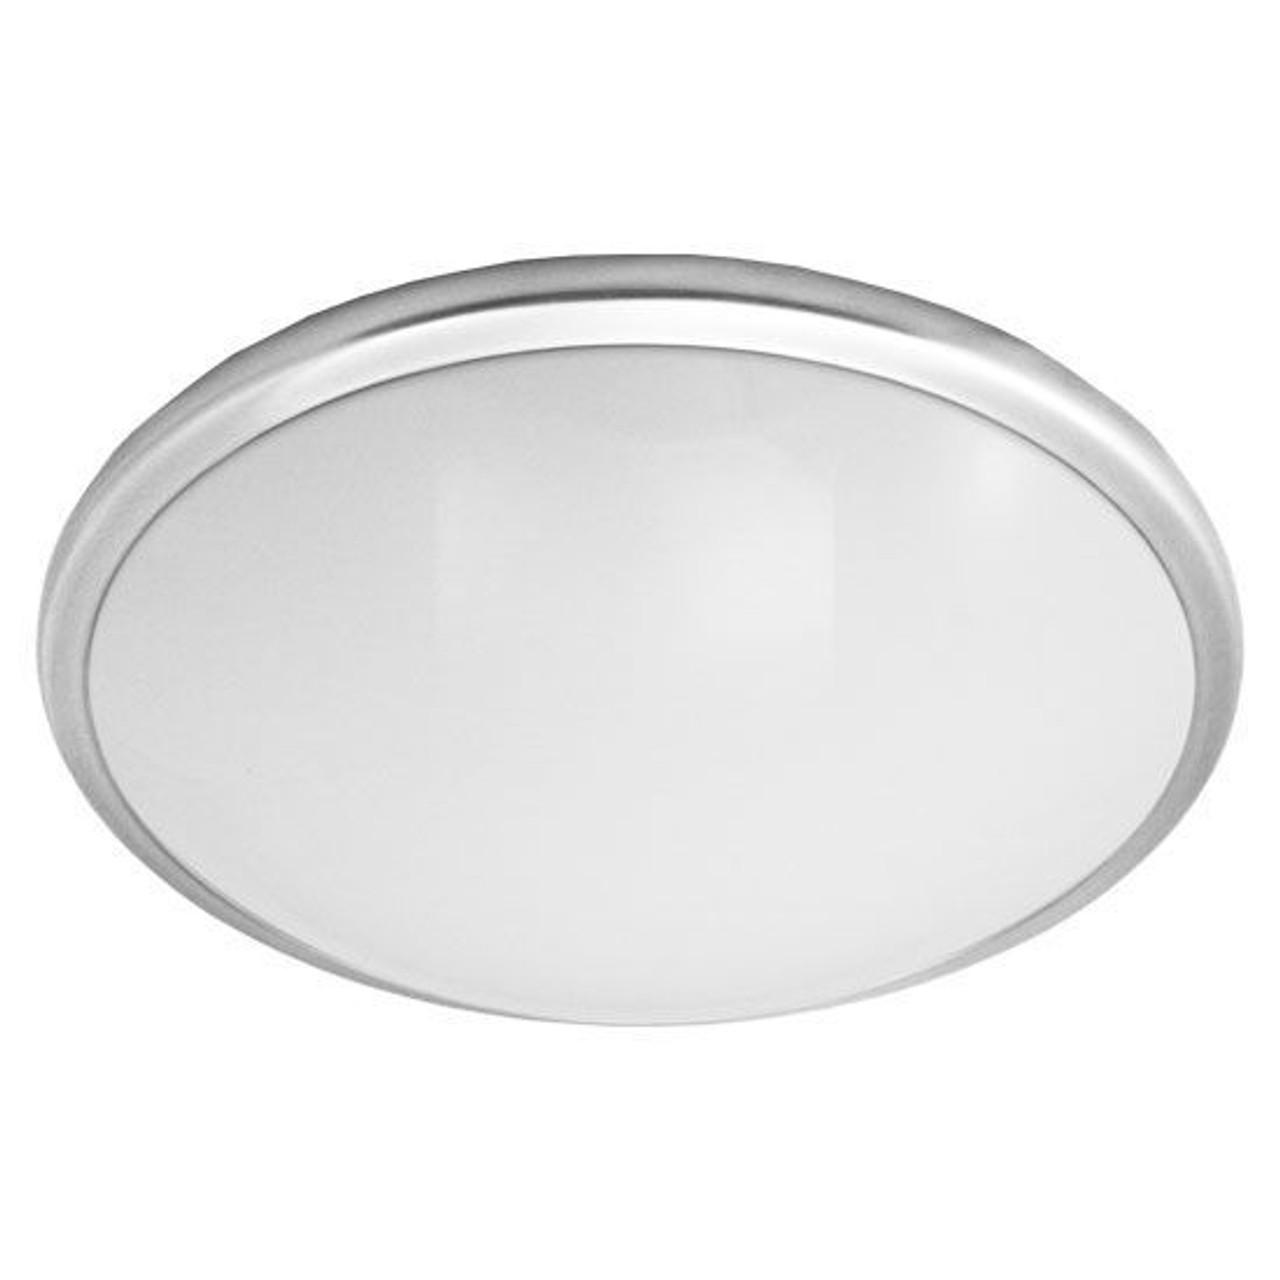 21 Large Round Low Profile Ceiling Light Brushed Nickel Rim 23w Led 4000k Ilighting Com